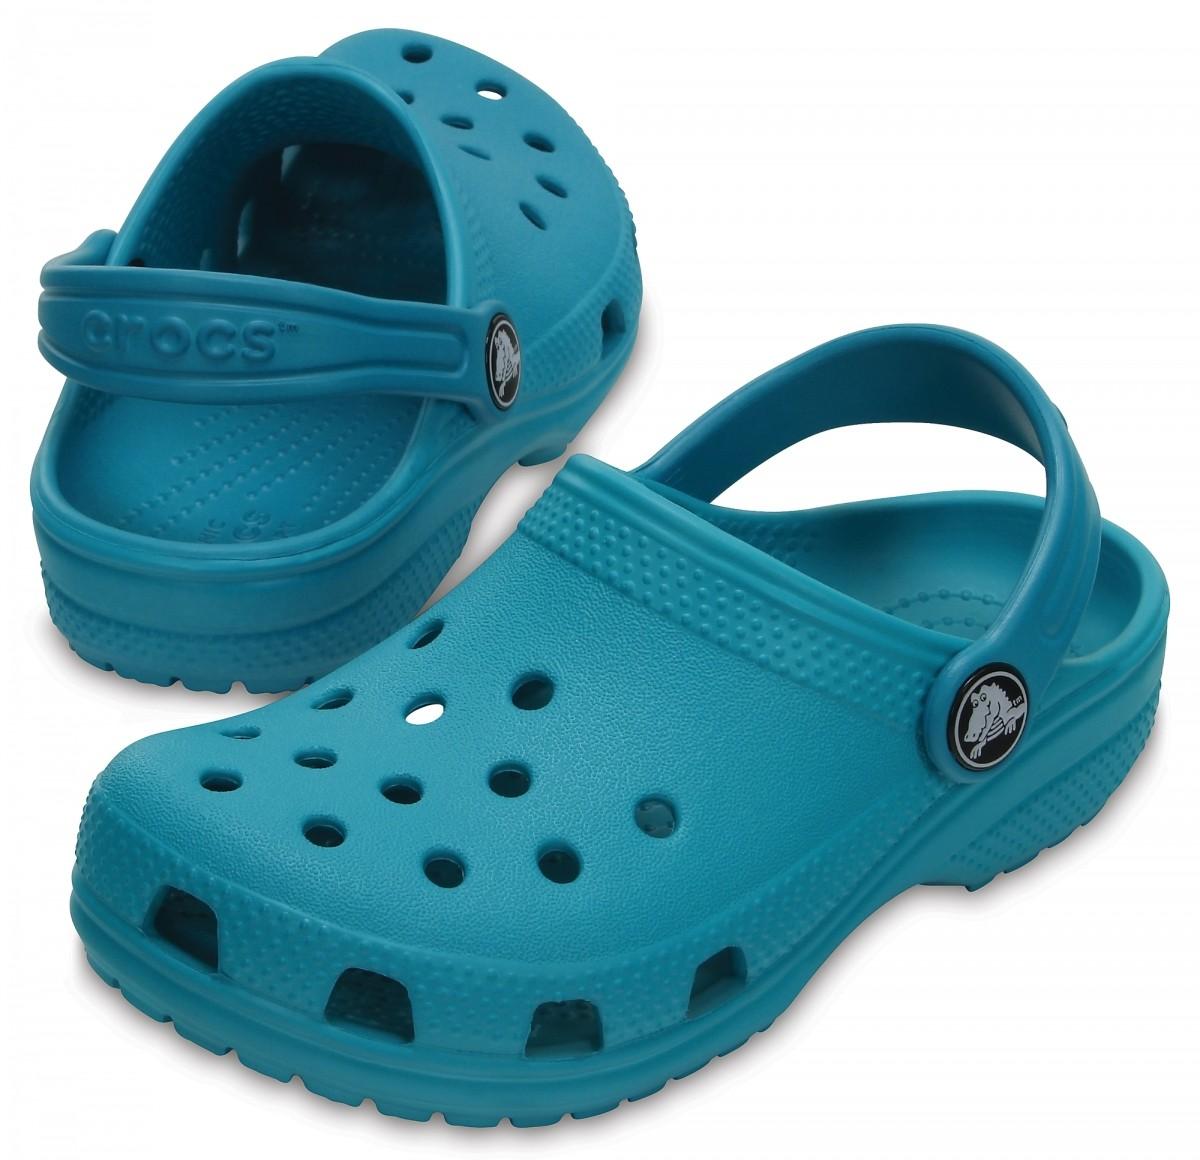 Pantofle (nazouváky) Crocs Classic Clog Kids - Turquoise 972a9905b5